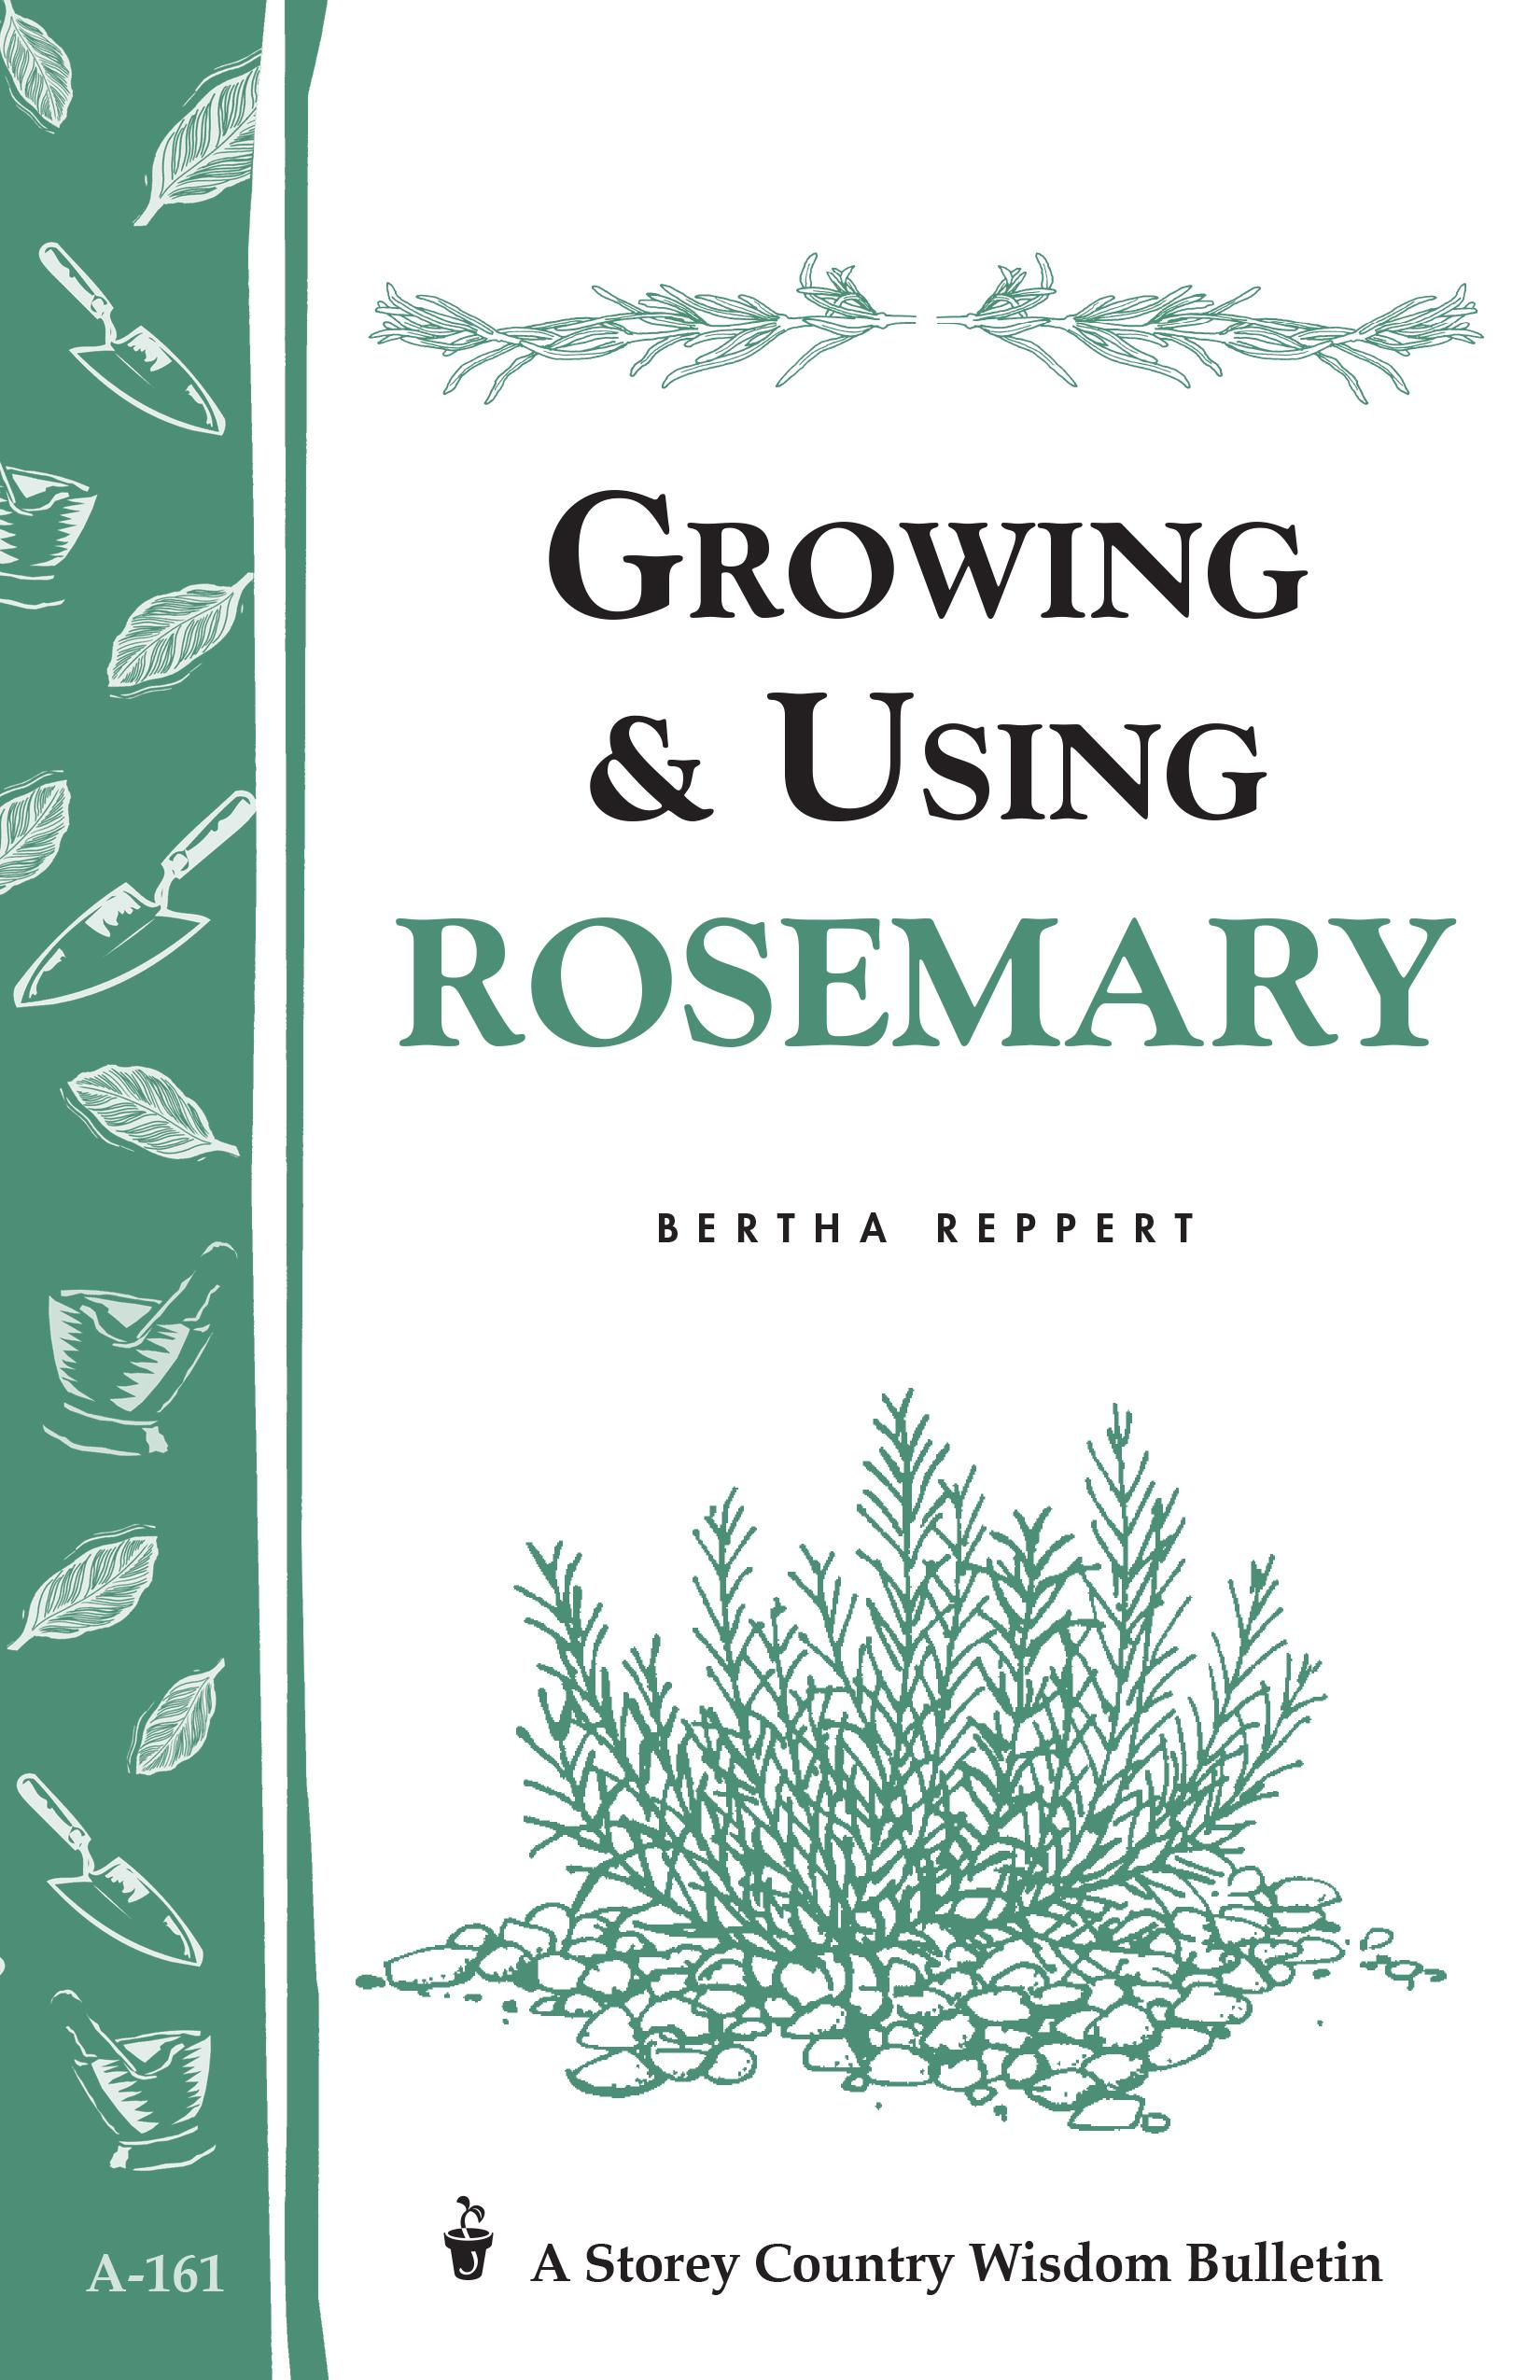 Growing & Using Rosemary Storey's Country Wisdom Bulletin A-161 - Bertha Reppert